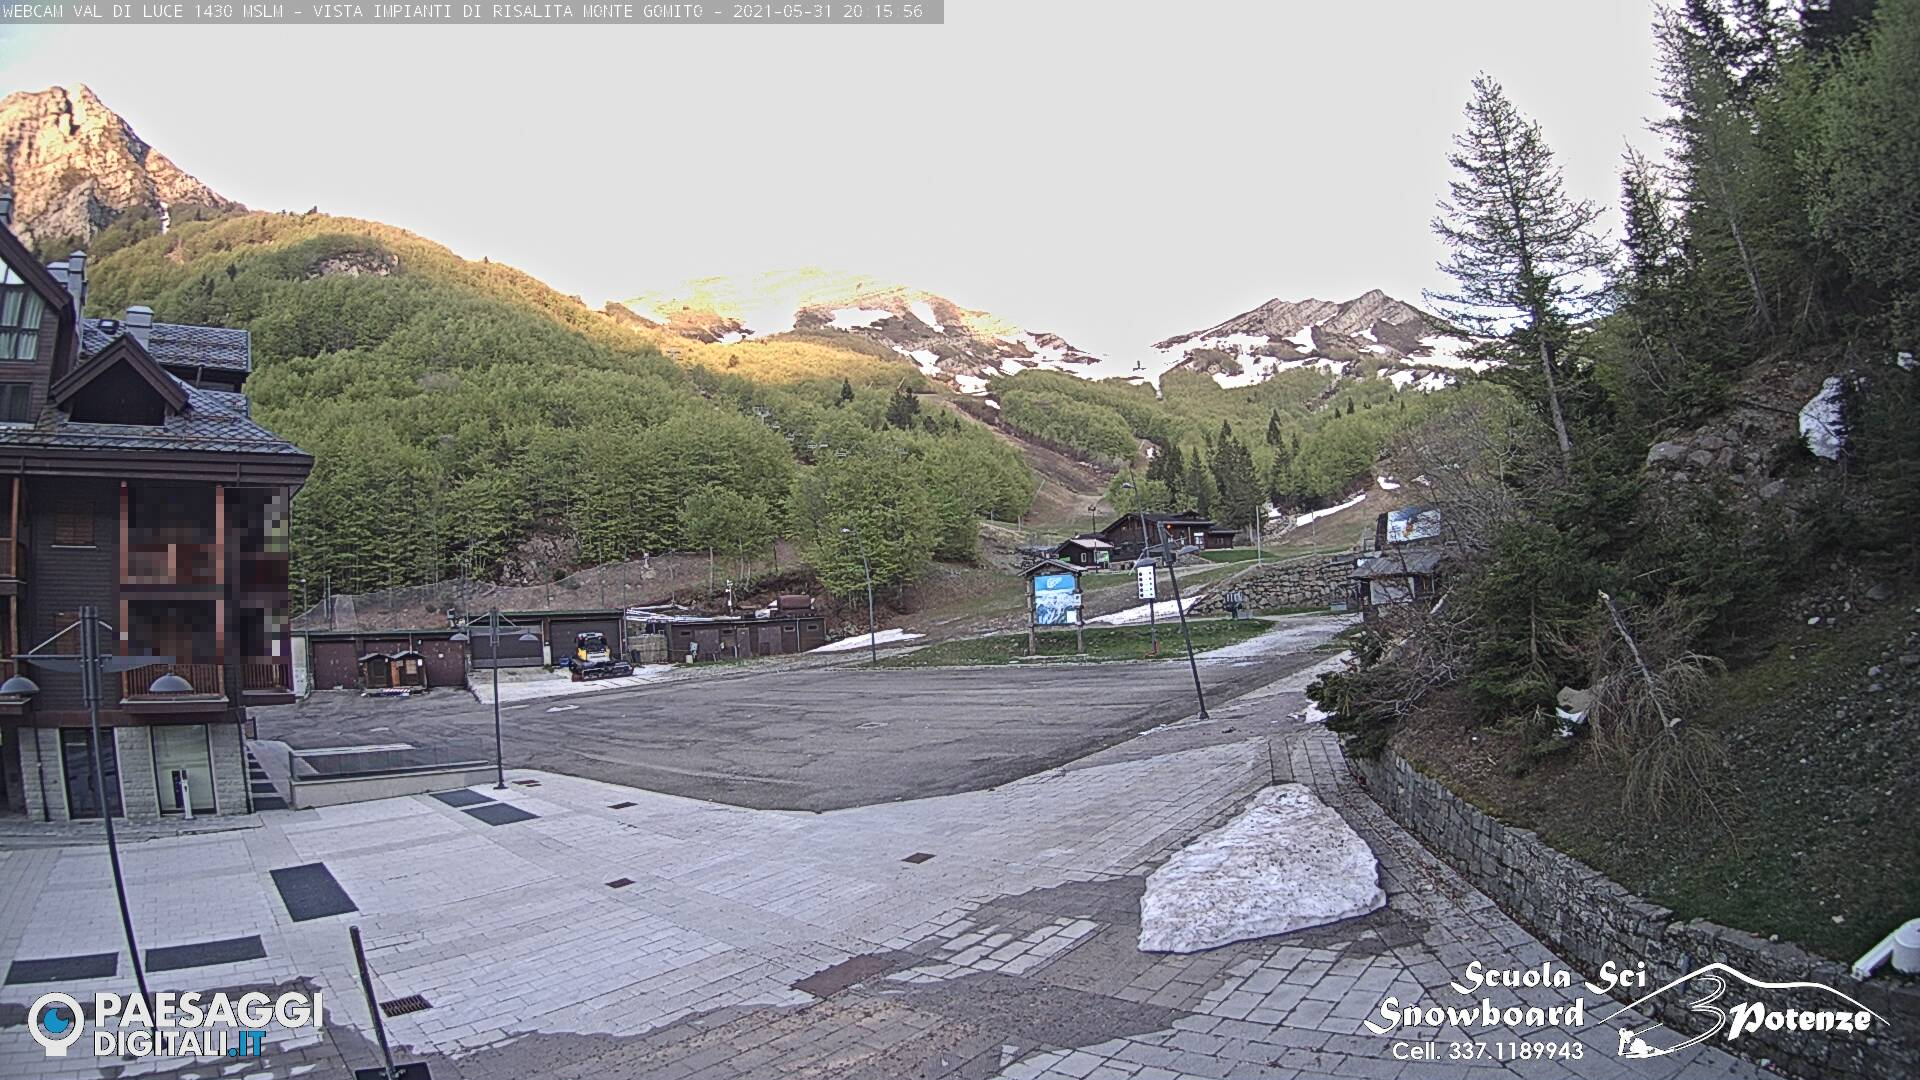 Webcam Abetone - Val di Luce (PT)